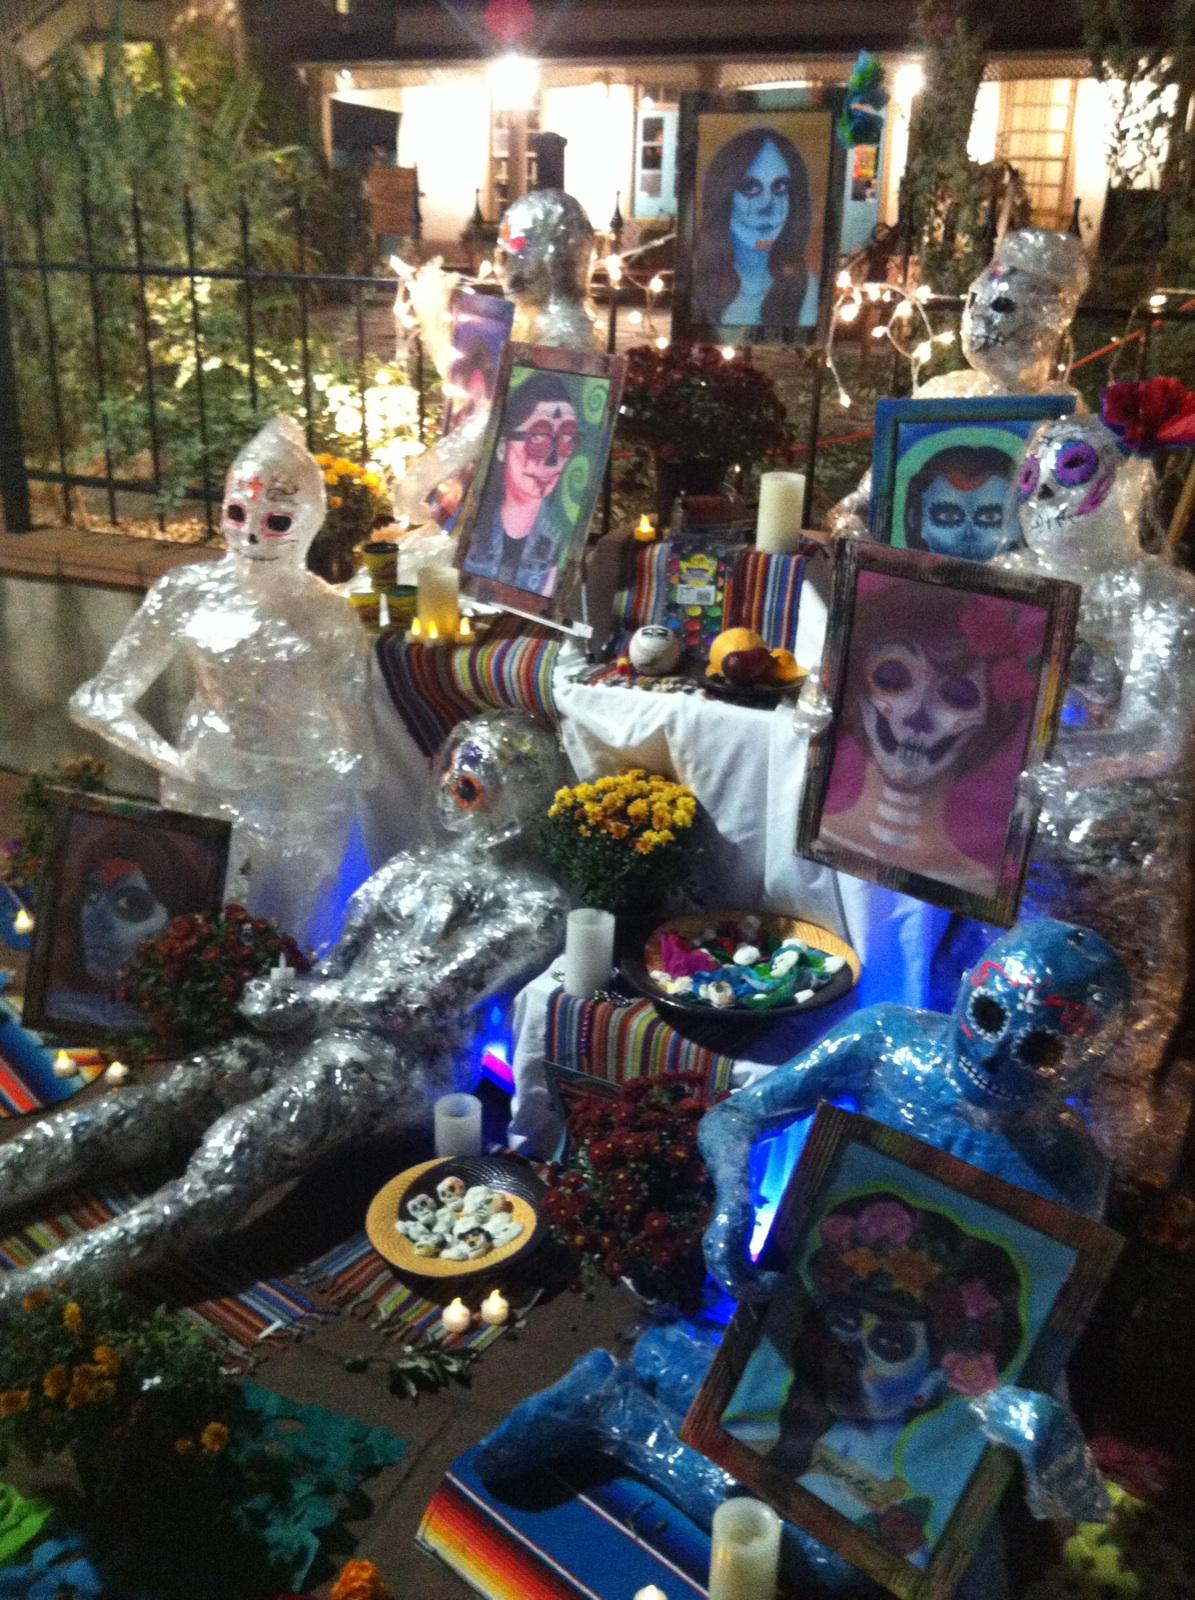 Amazing artistic alters at Dia de los Muertos Fest in La Villita. Photo courtesy of Regan Turner